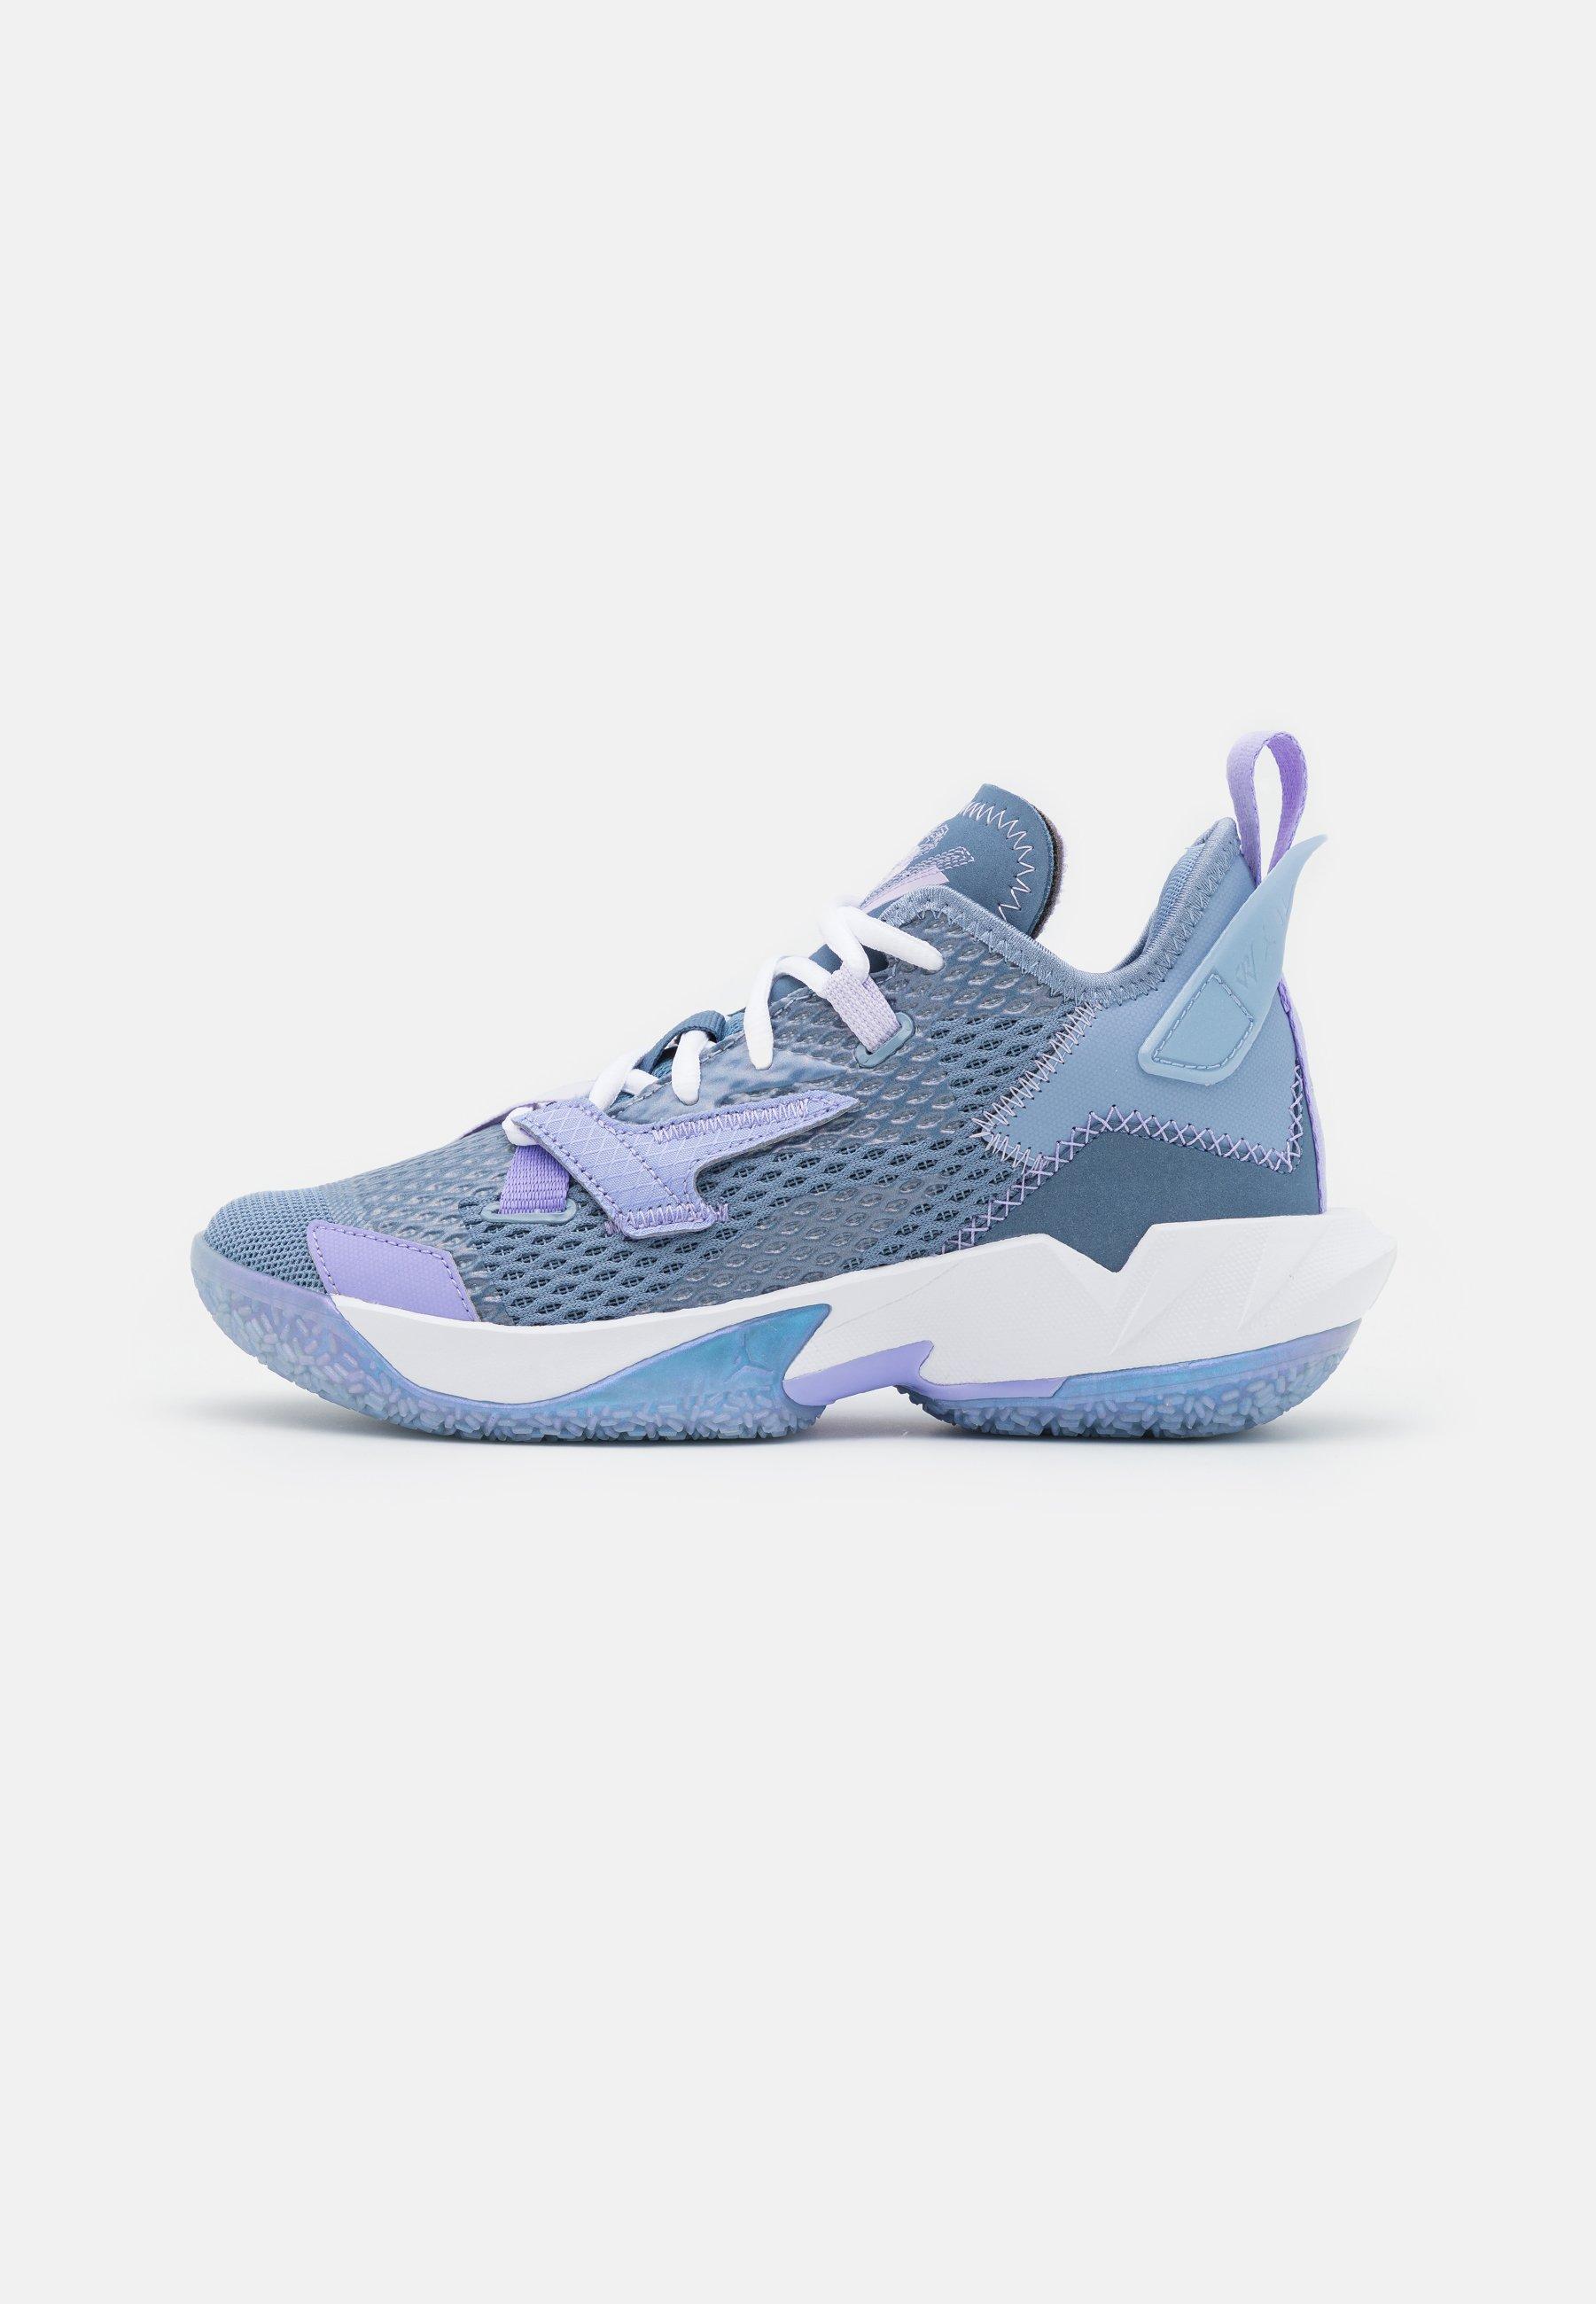 Enfant WHY NOT ZER0.4 BG UNISEX - Chaussures de basket